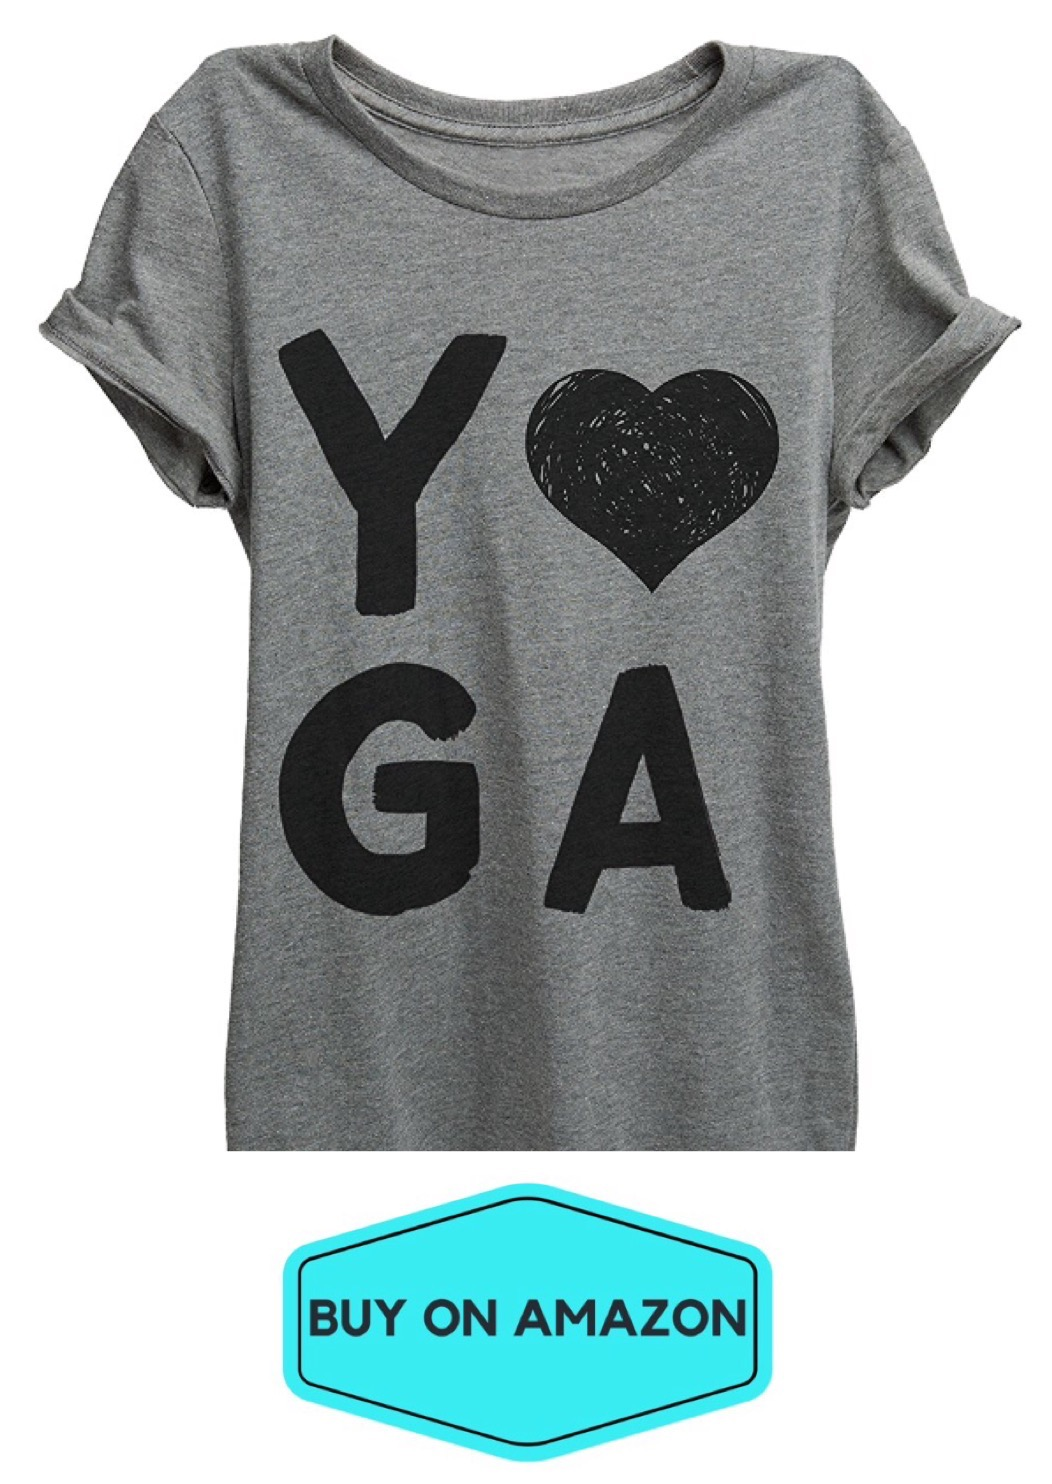 I Heart Yoga Relaxed Tee